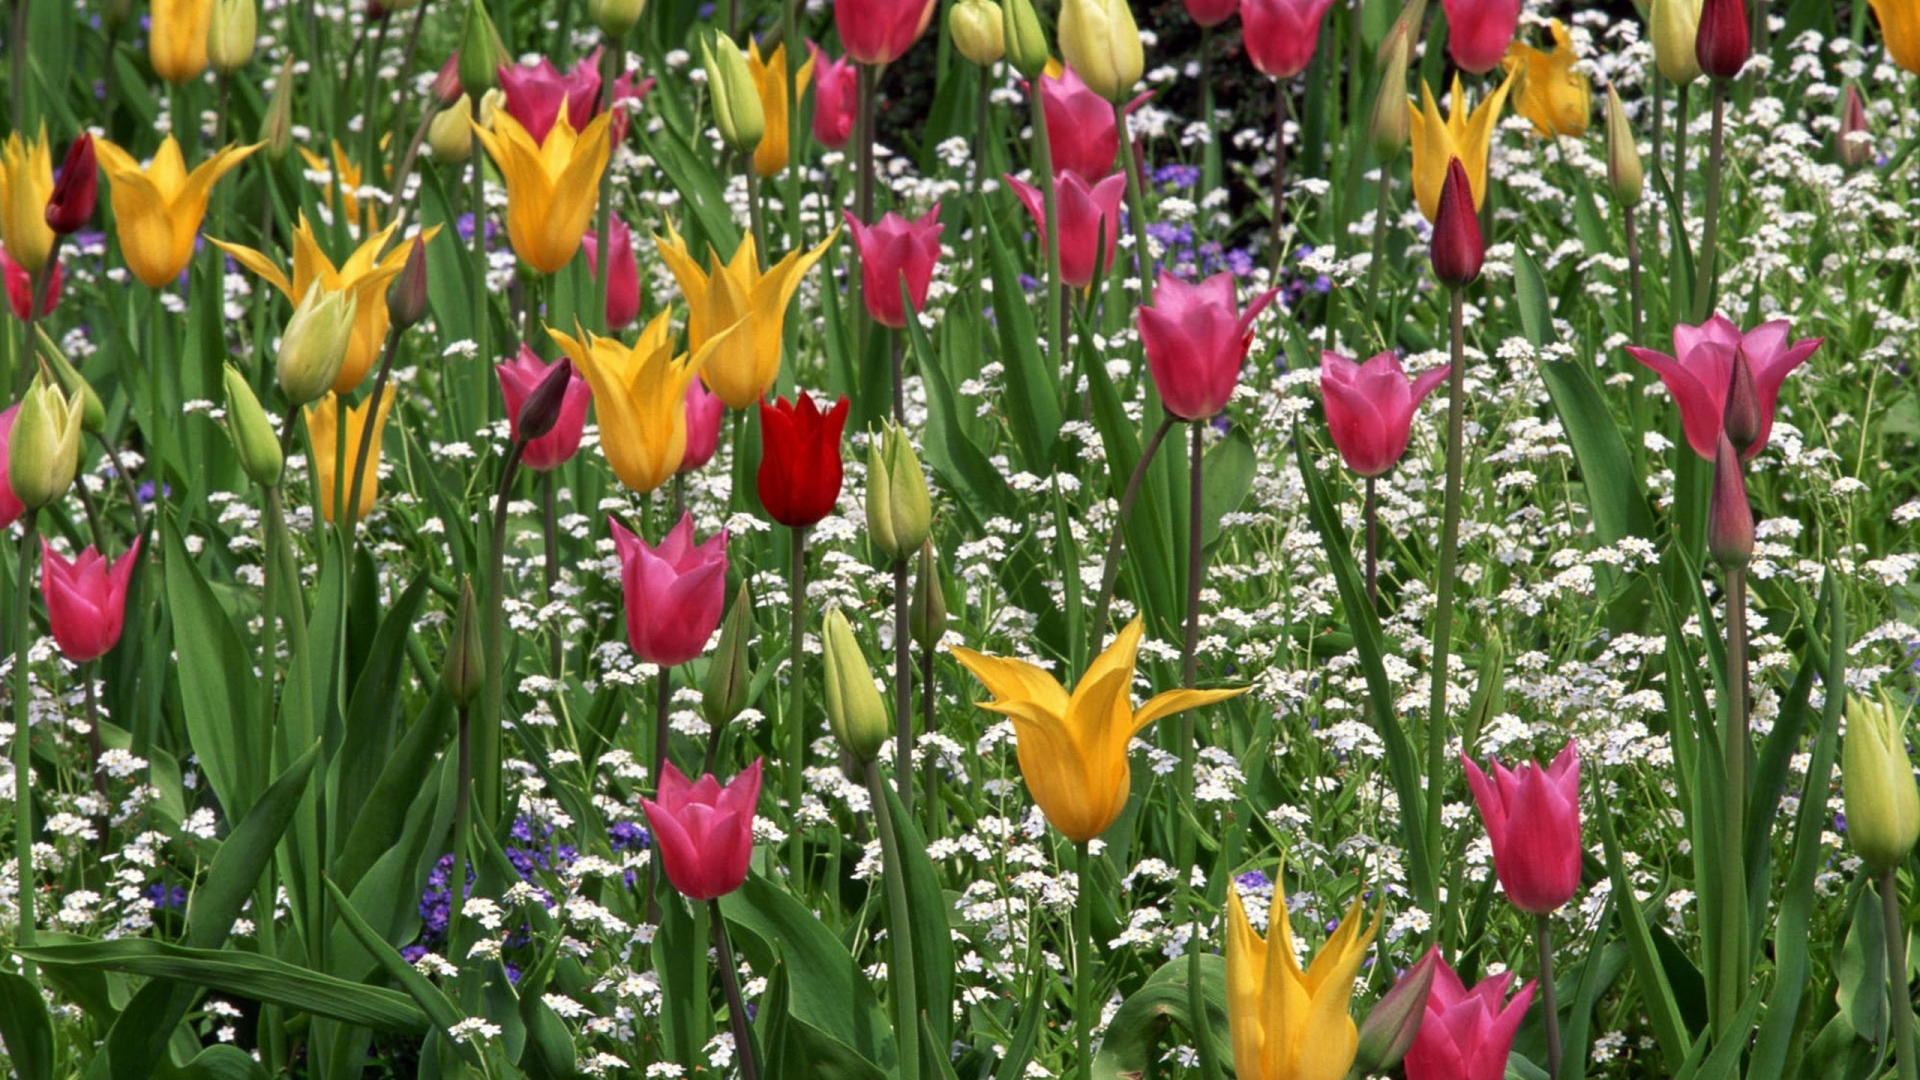 Hd Hintergrundbilder Tulpen Garten Blühen Pflanzen Stengel Rosa ... Tulpen Im Garten Pflanzen